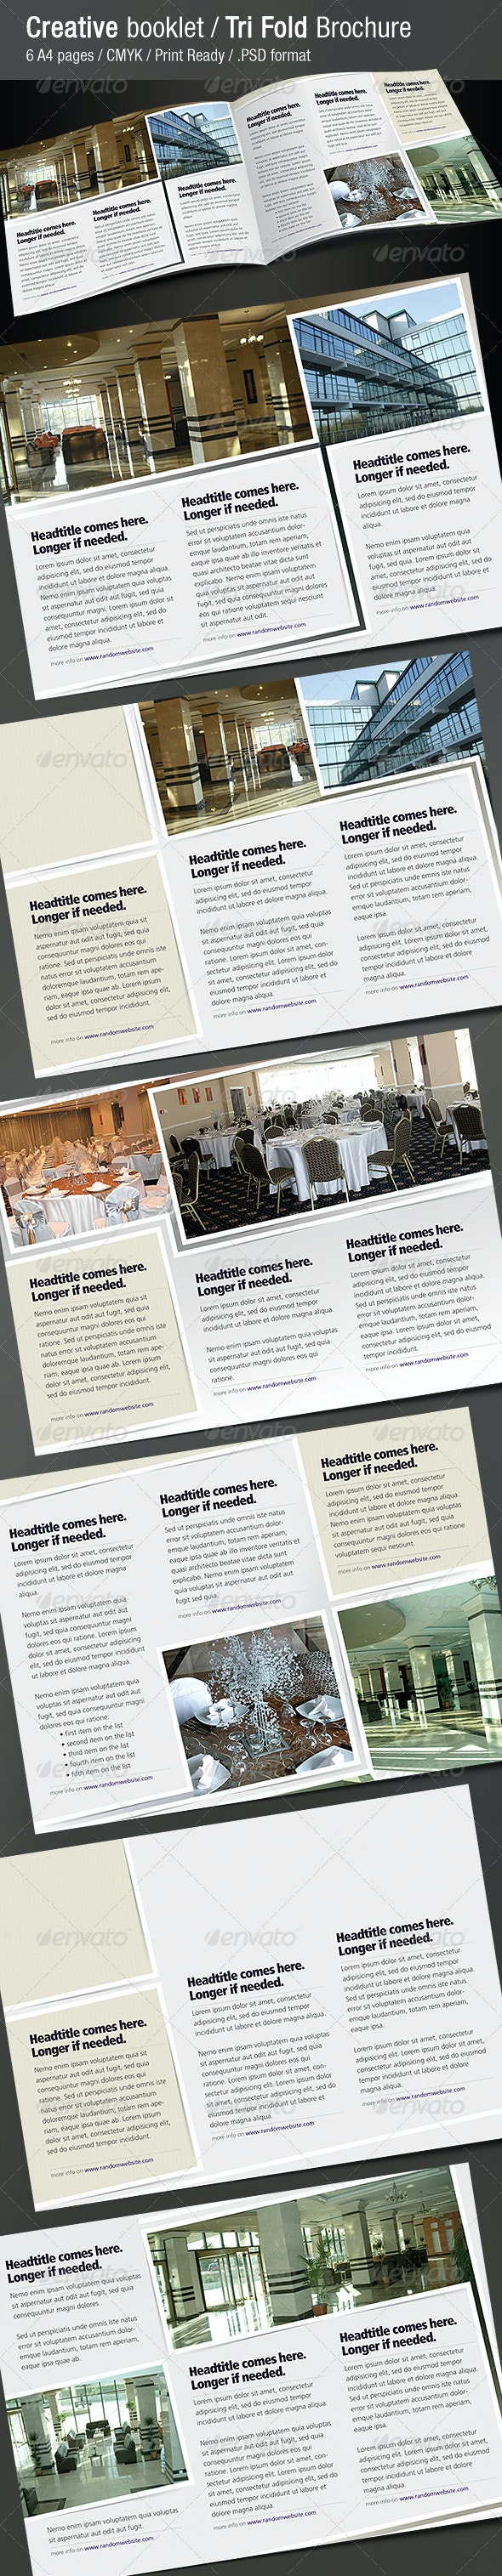 Creative Booklet / Tri Fold Brochure - Corporate Brochures